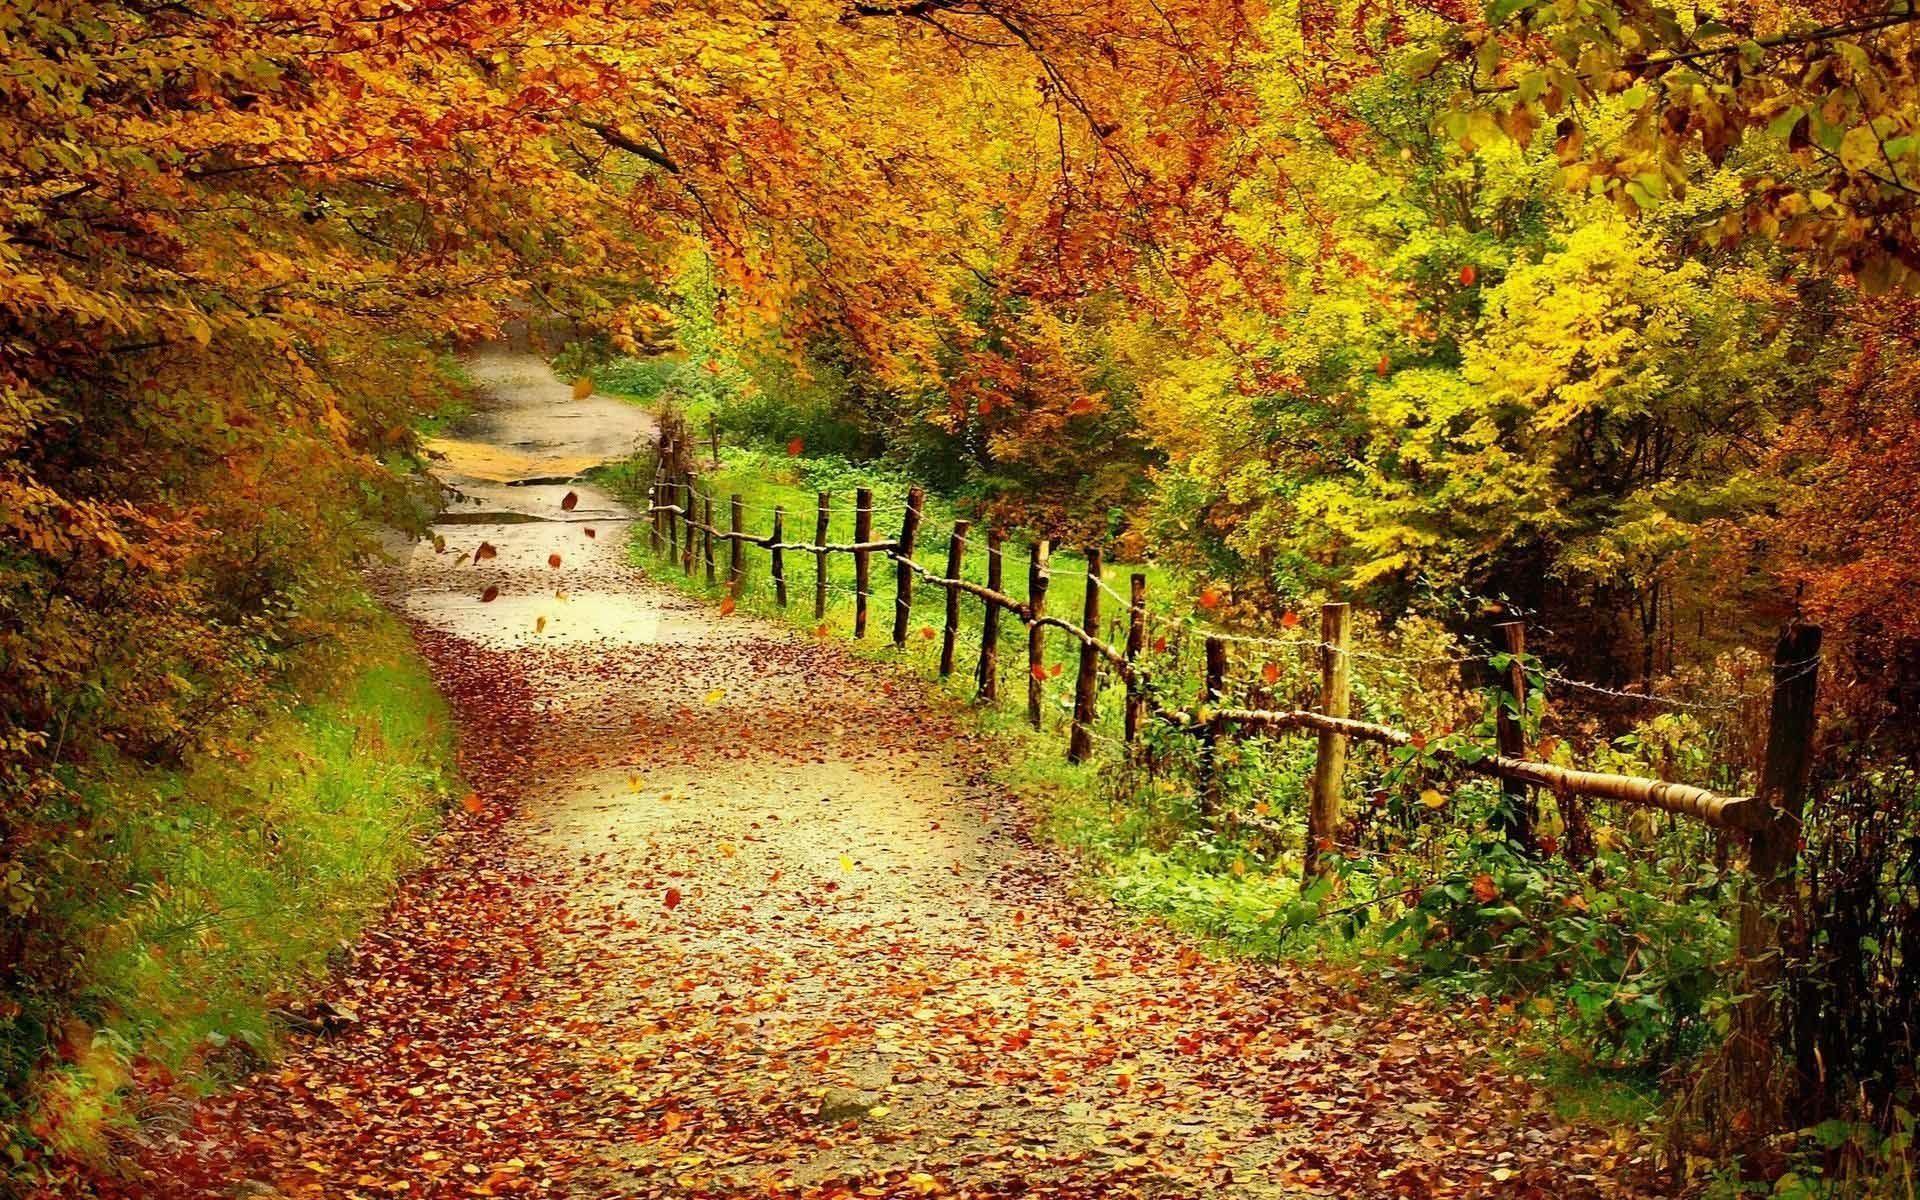 wallpaper.wiki-HD-Fall-Foliage-Wallpaper-PIC-WPE005047